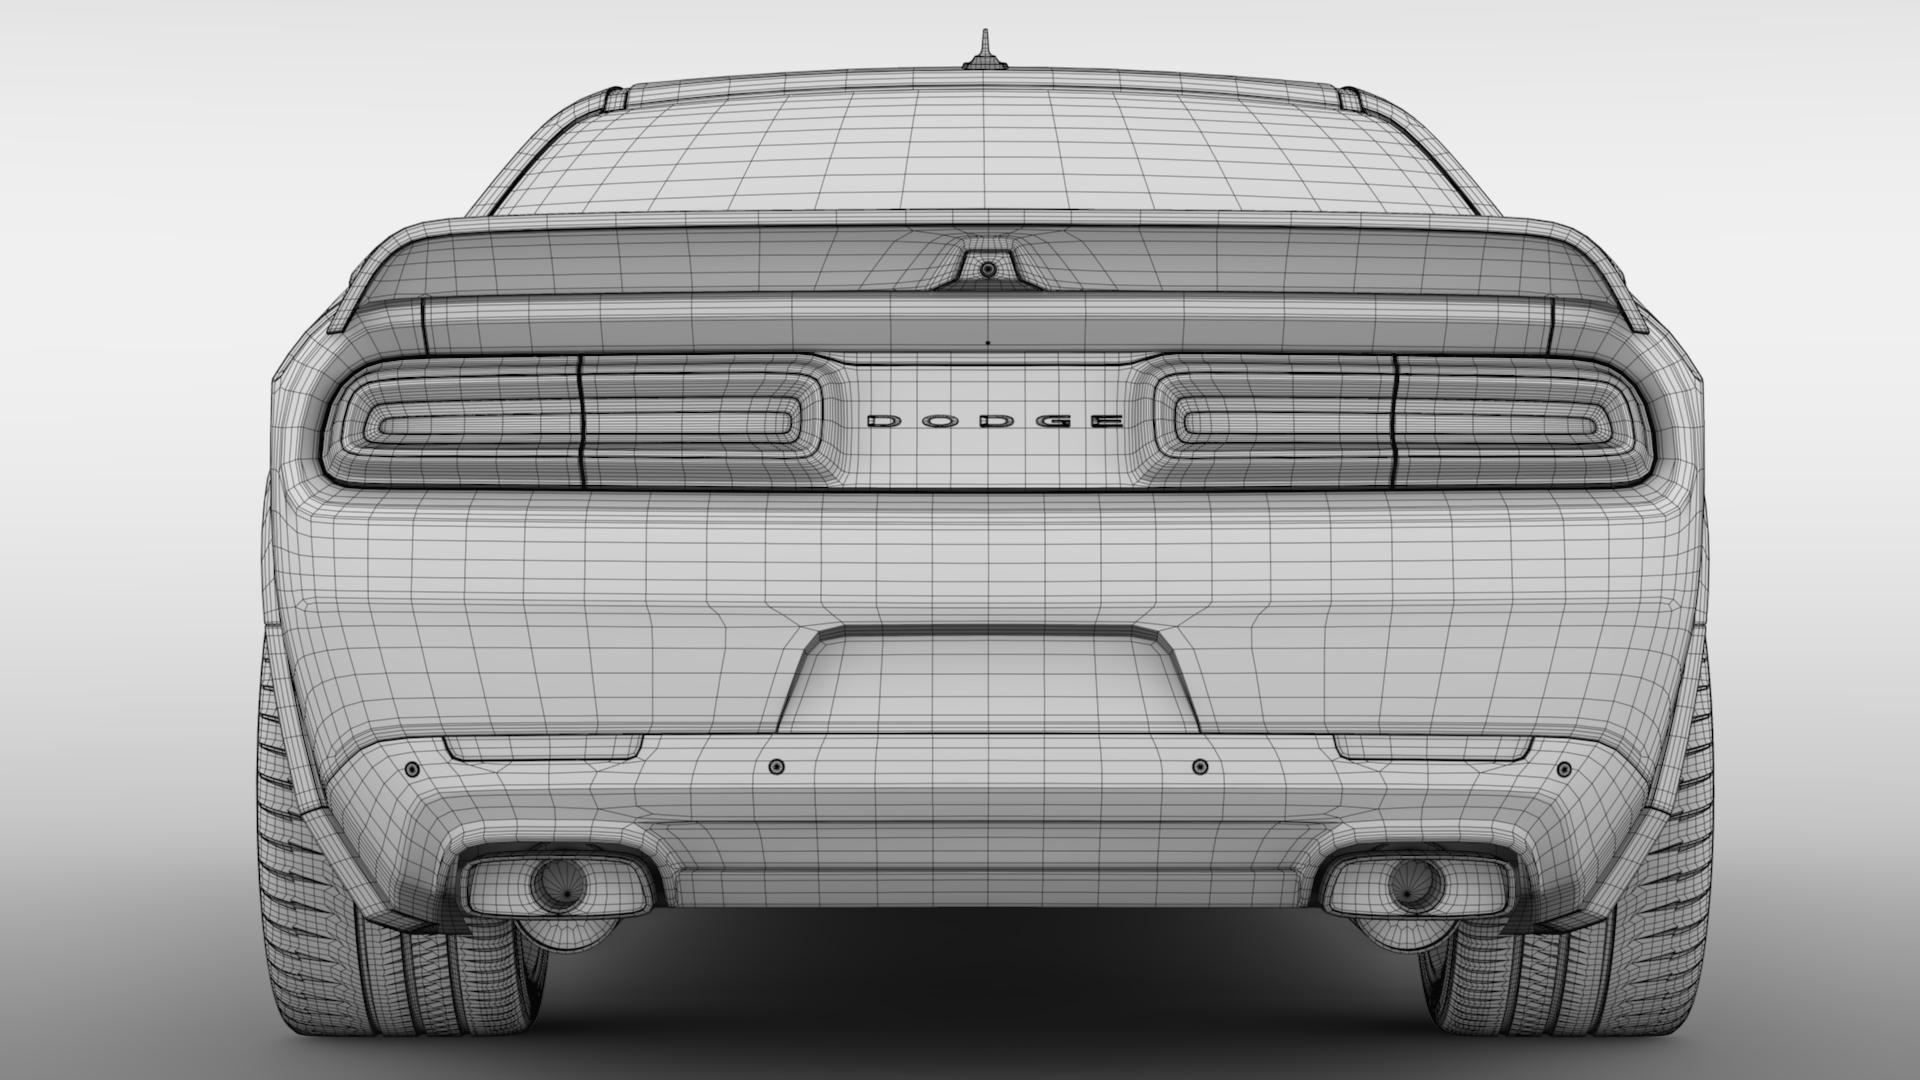 Dodge Challenger Srt Hellcat Redeye Widebody Lc 3d Model Flatpyramid